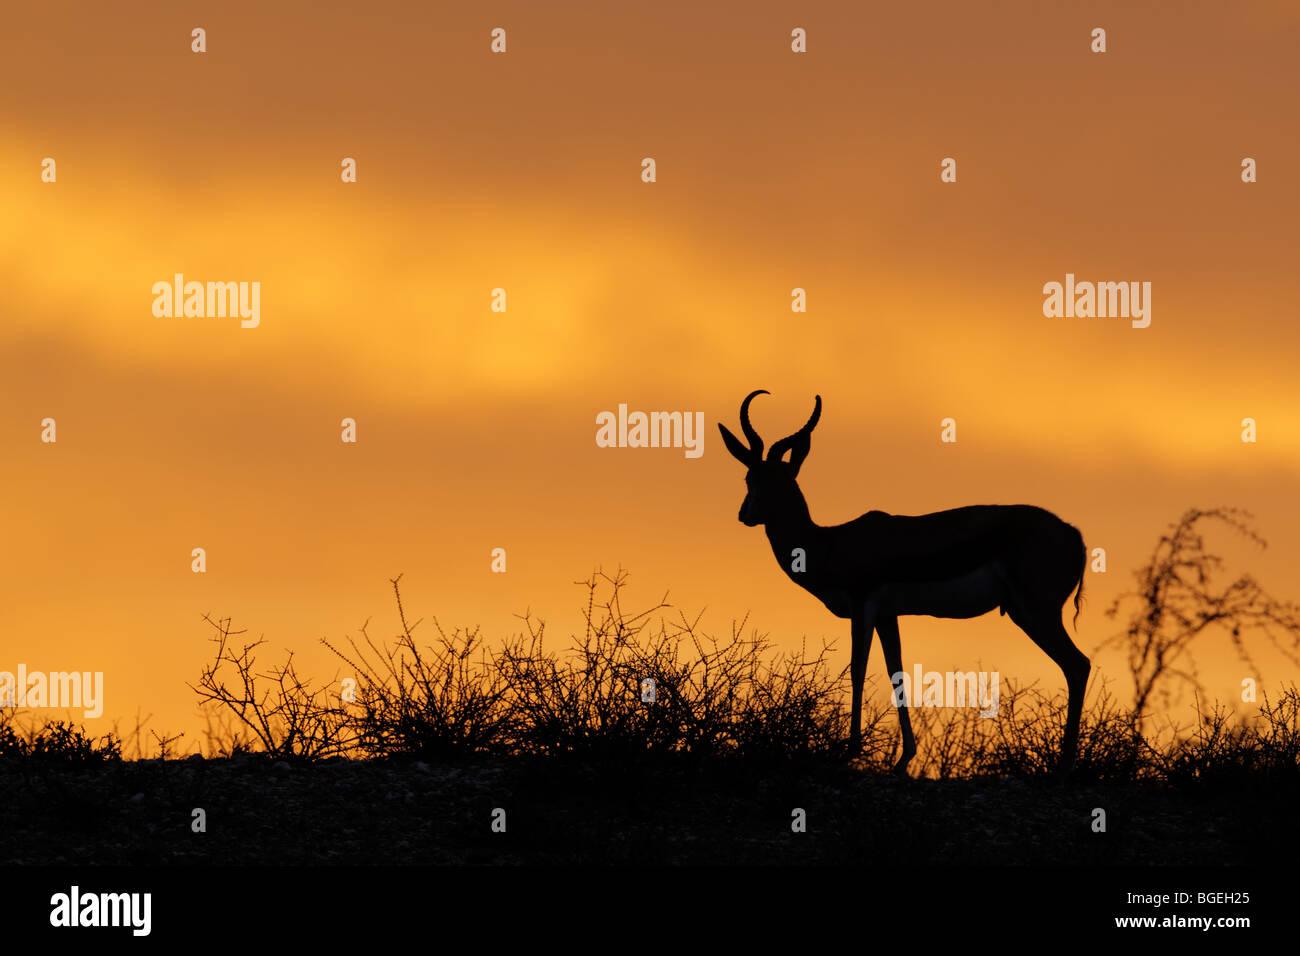 Springbock Antilope (Antidorcas Marsupialis) gegen ein roter Himmel, Kgalagadi Transfrontier Park, Südafrika Stockbild